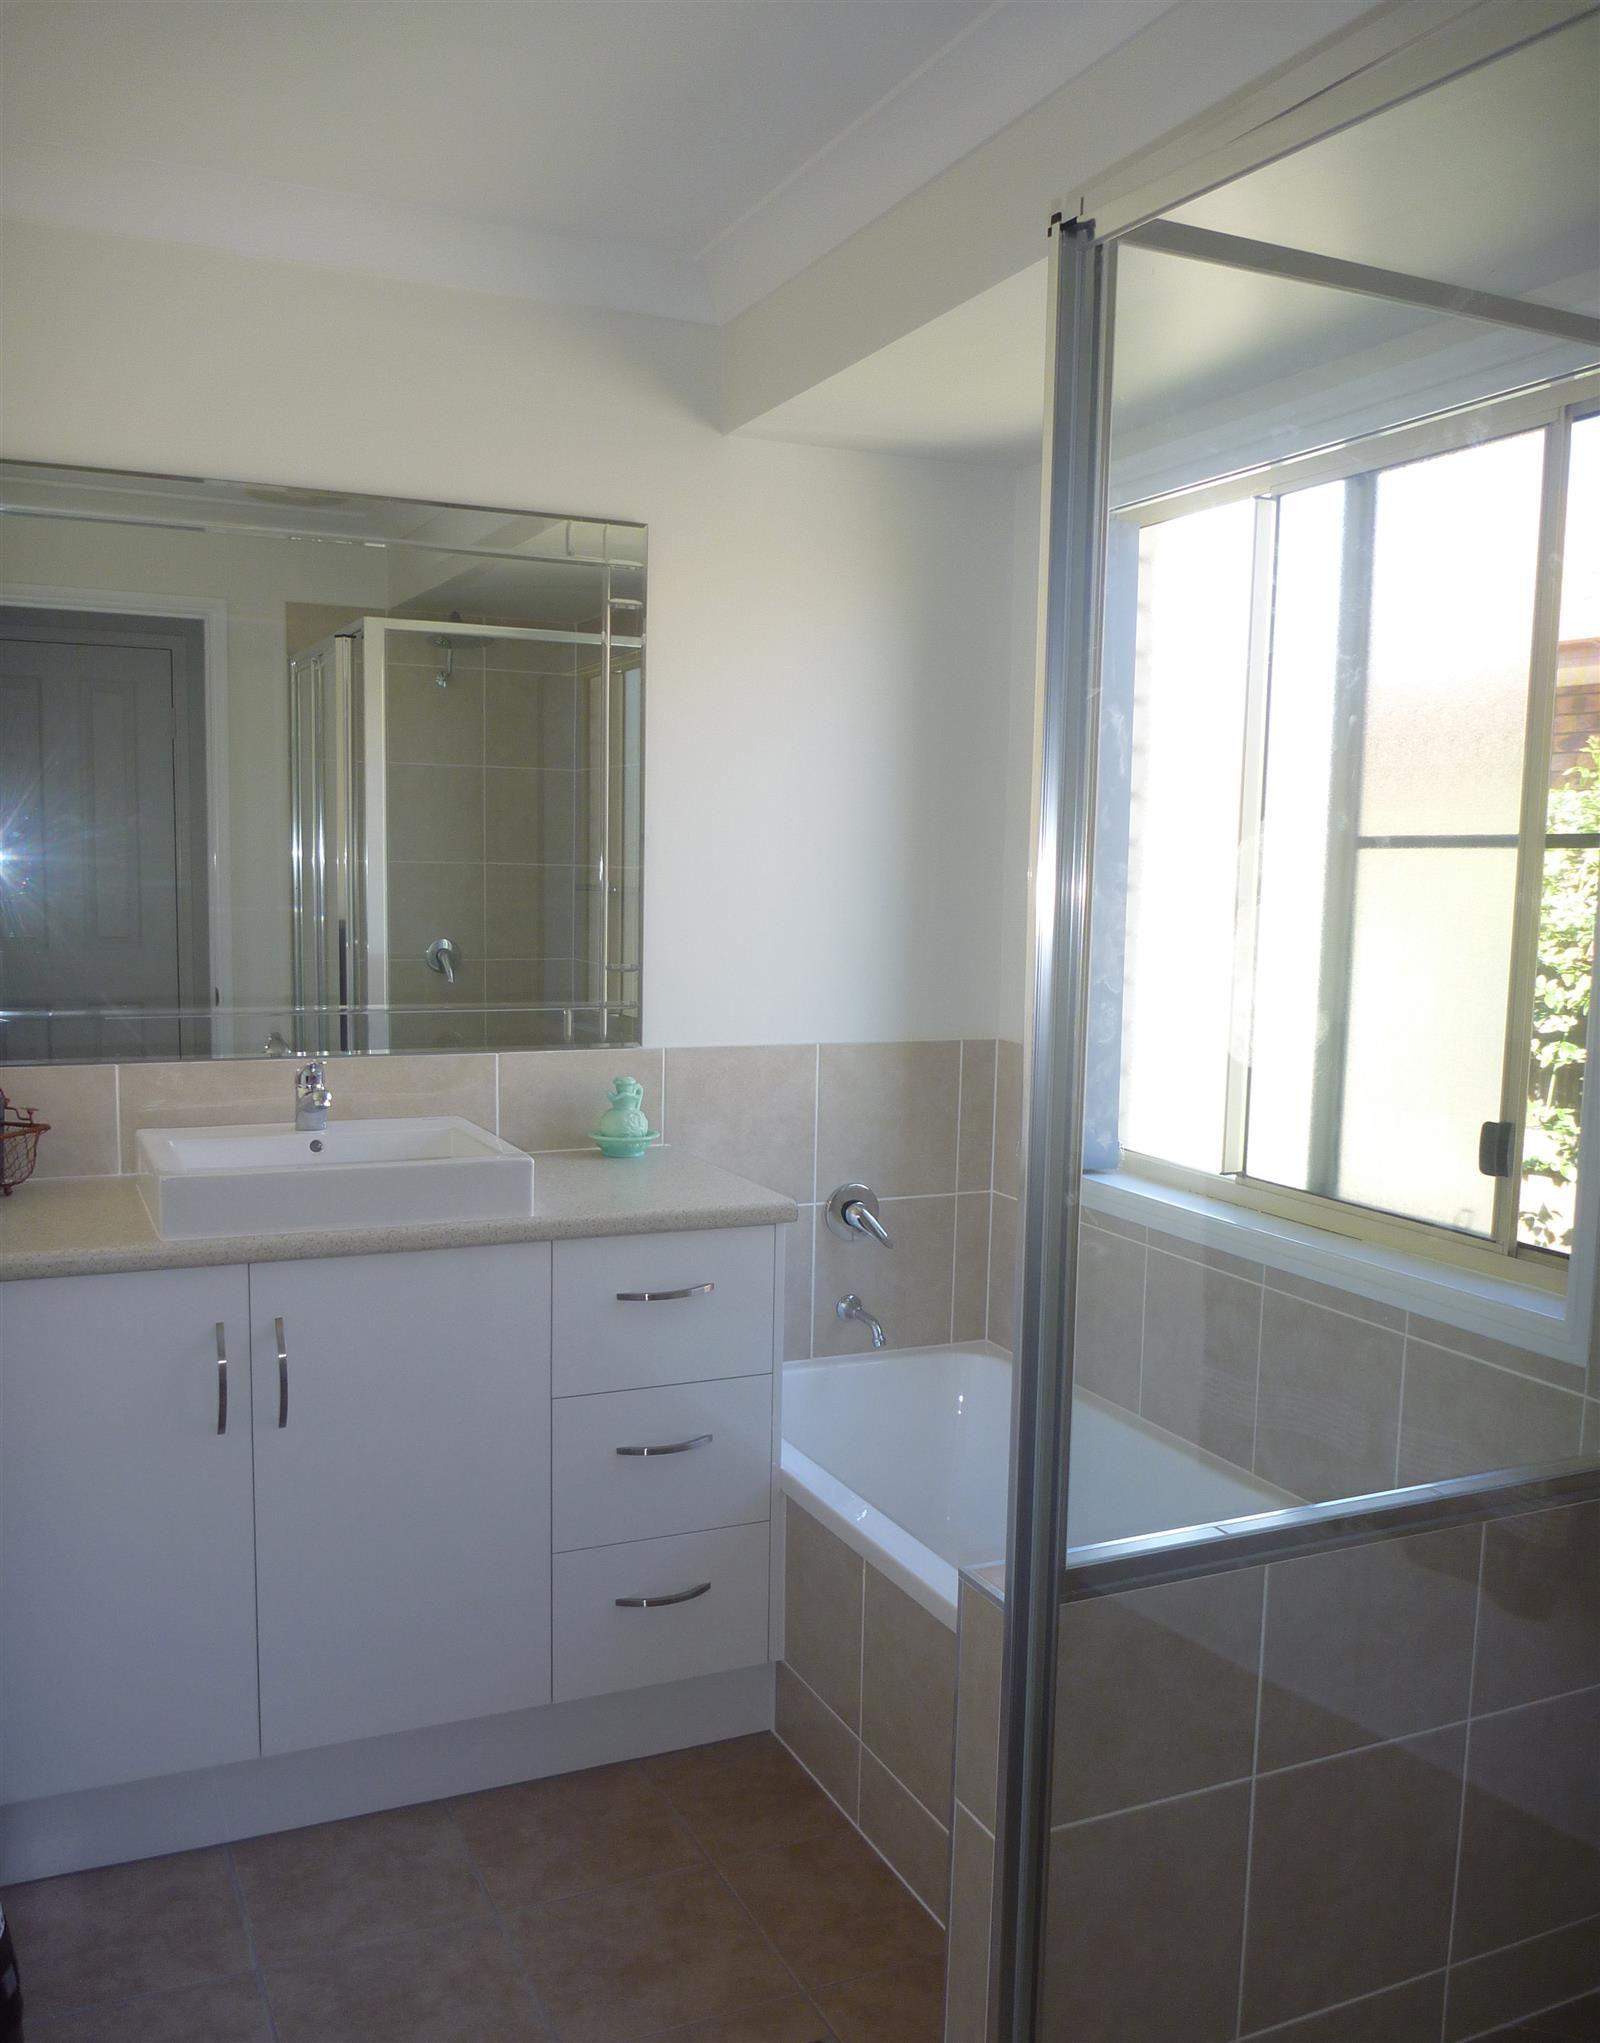 New modern bathroom with plenty of storage! @smithandsonsqld #renovation #bathroom